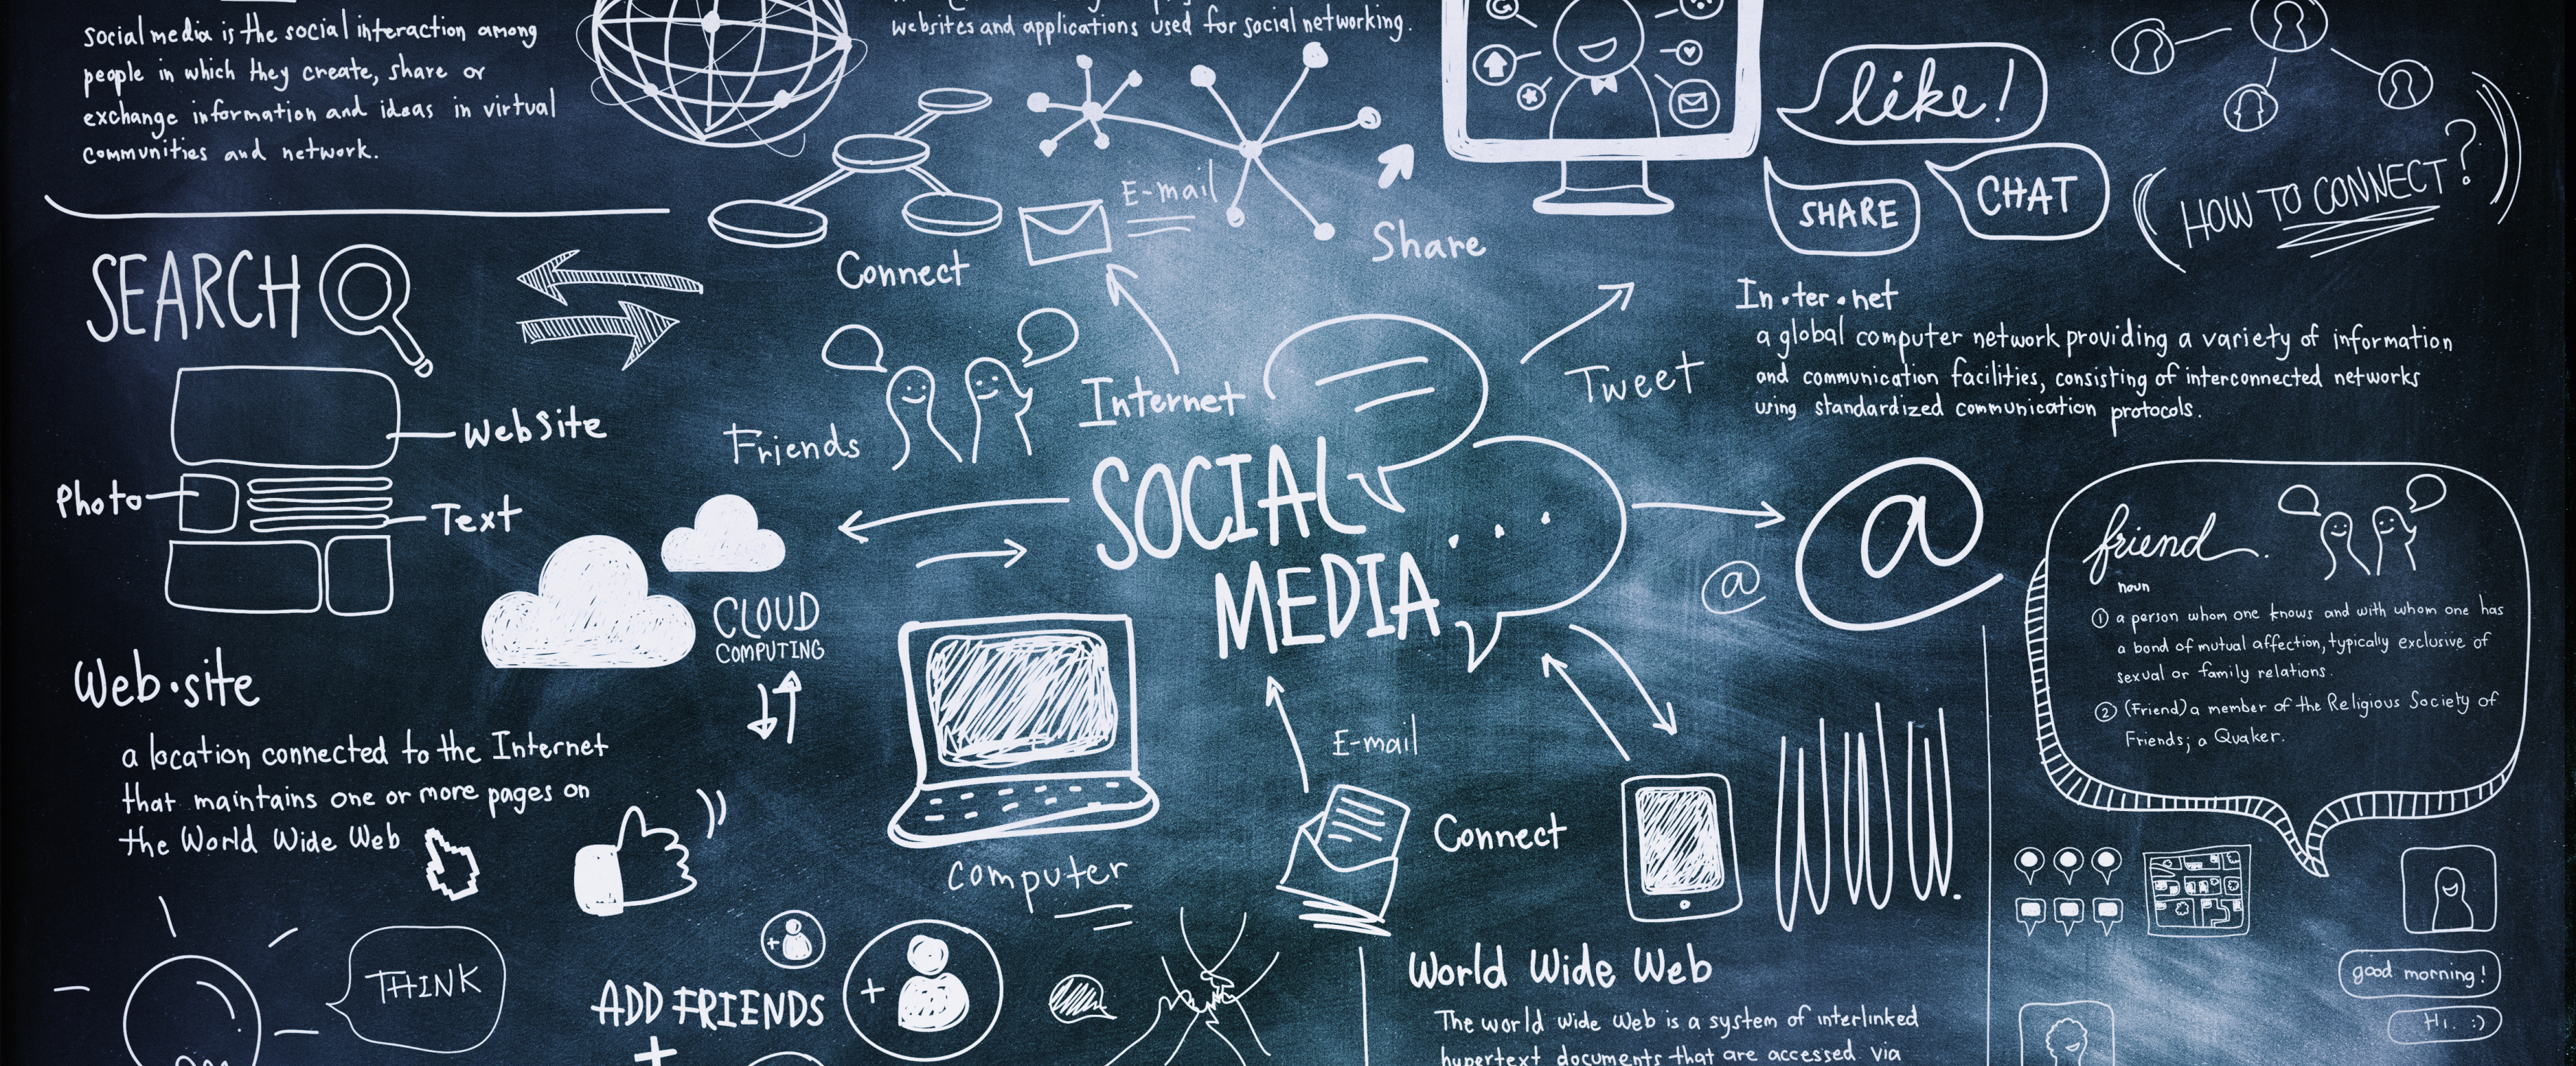 social_media-8.png